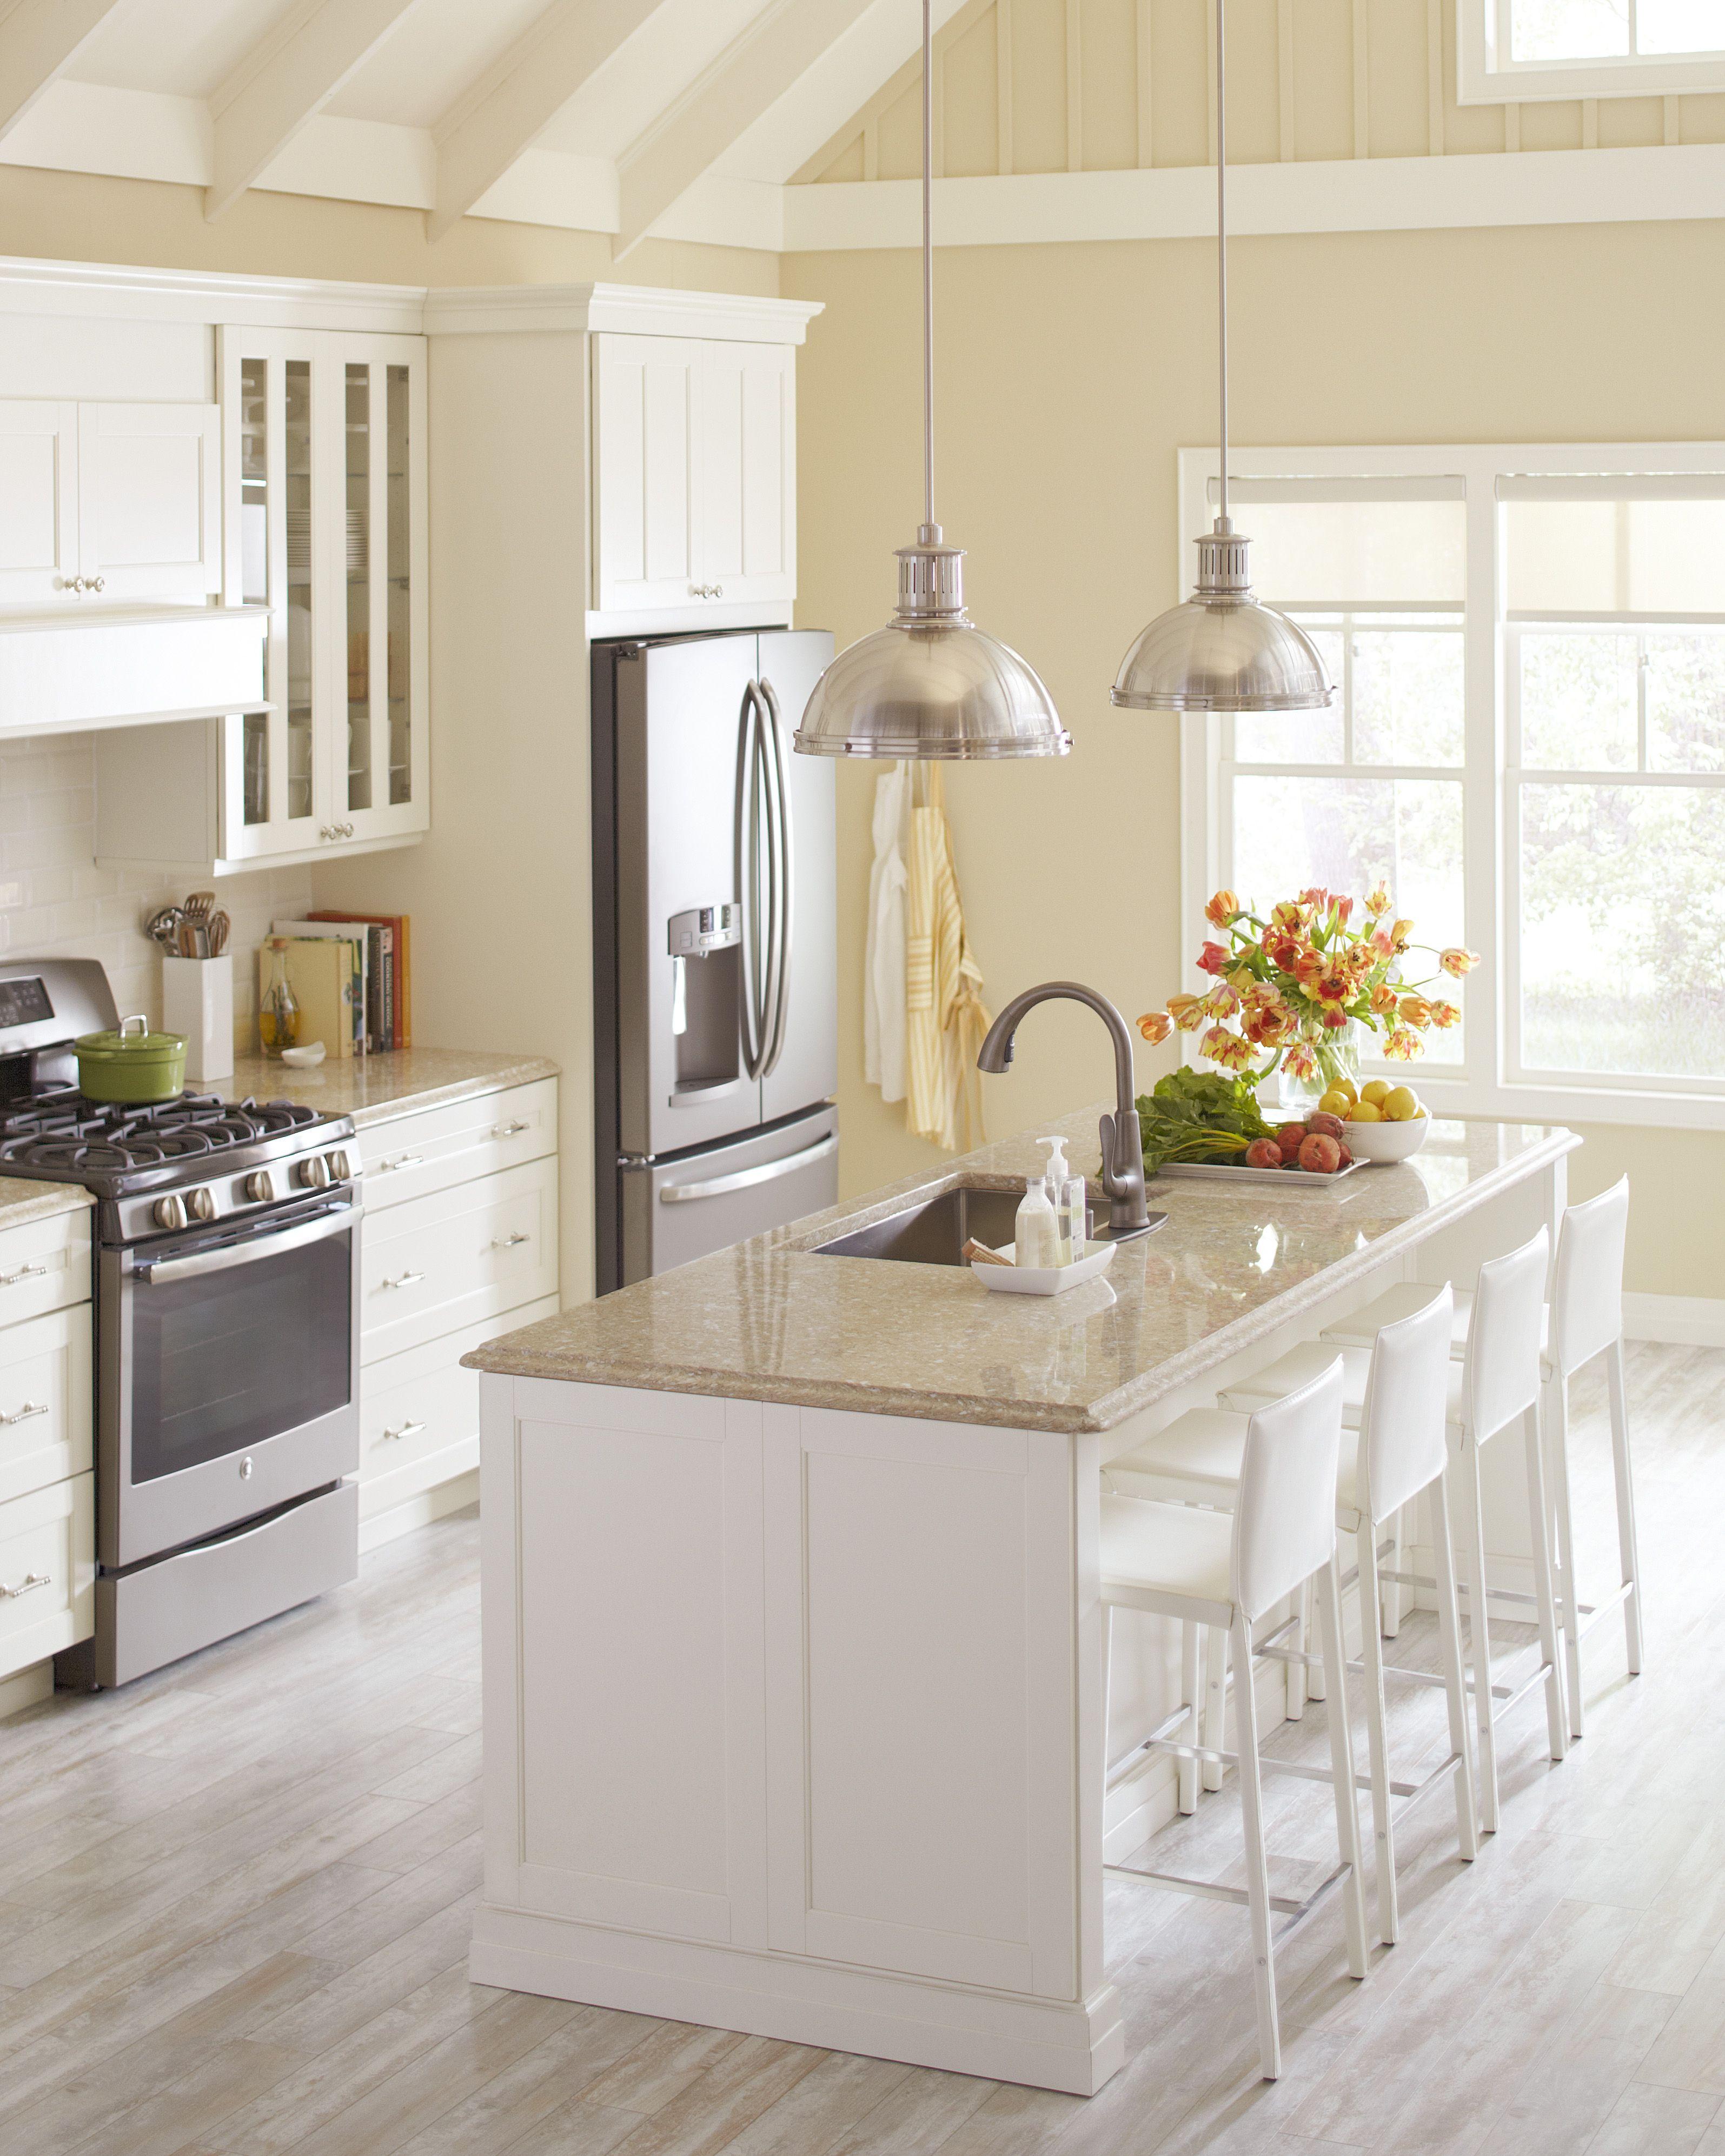 Home Depot Quartz And Corian Countertops Countertop